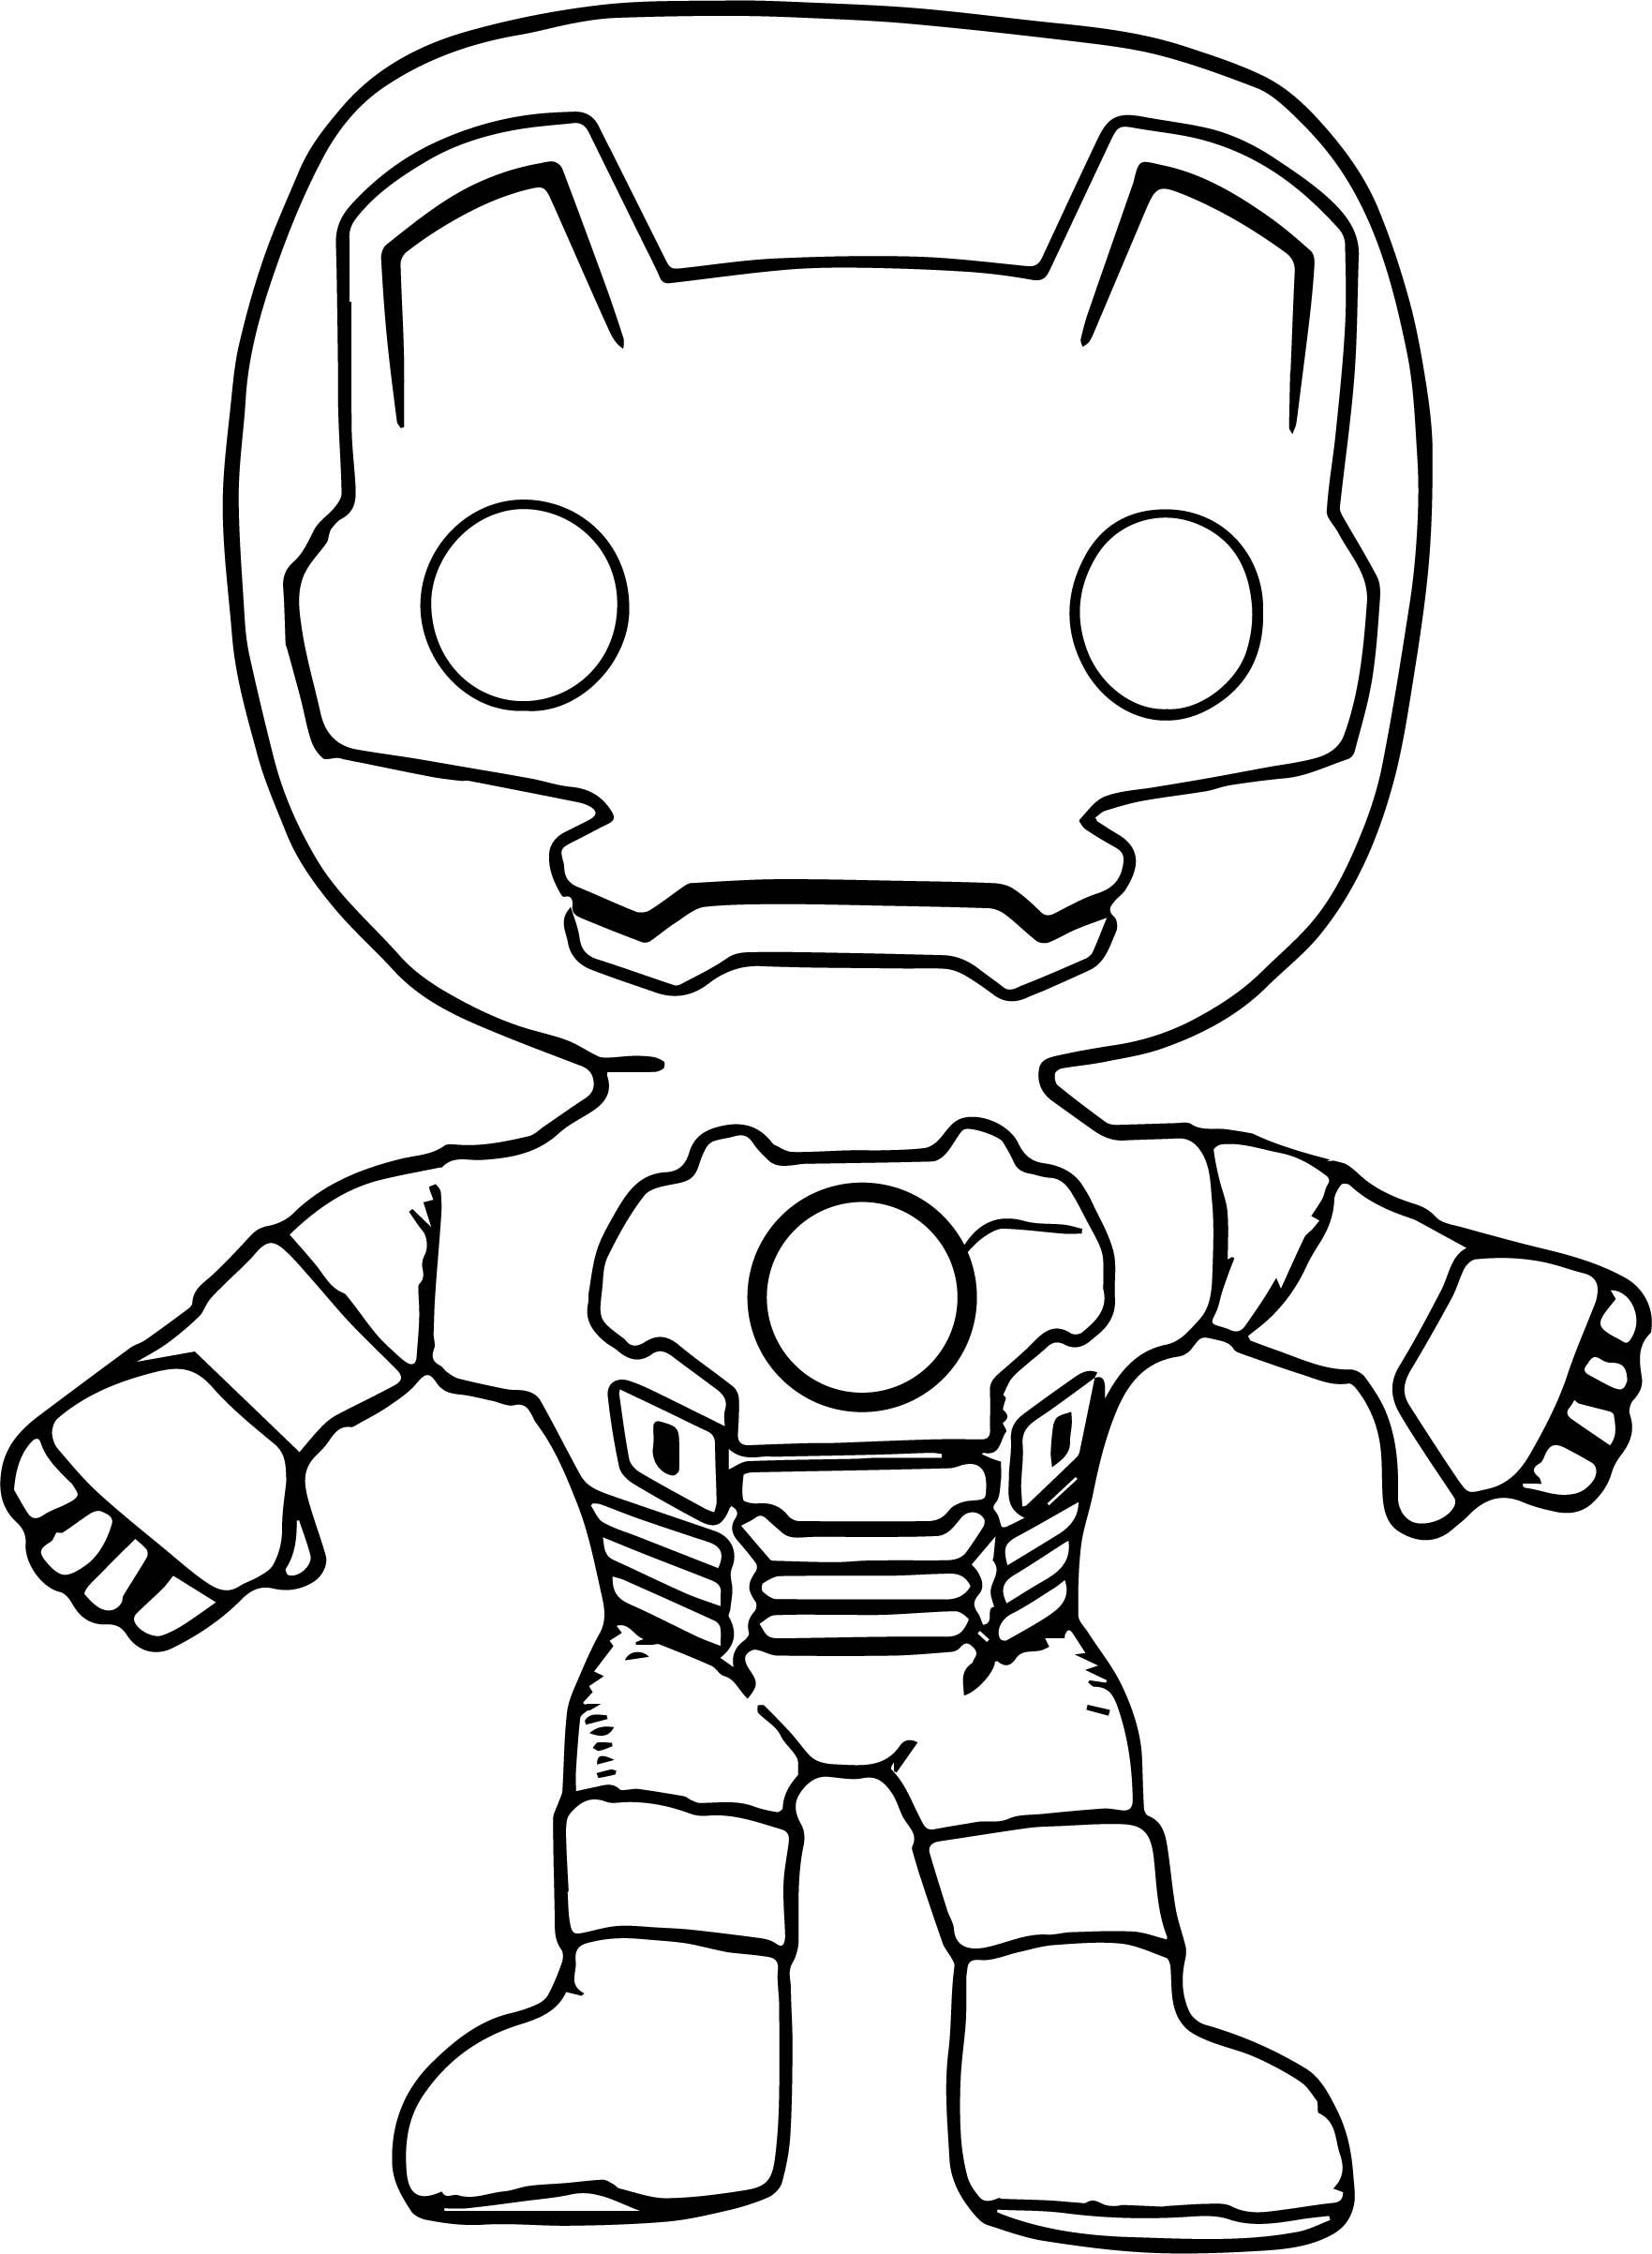 Cool Avengers Iron Man Chibi Coloring Page Avengers Coloring Chibi Coloring Pages Superhero Coloring